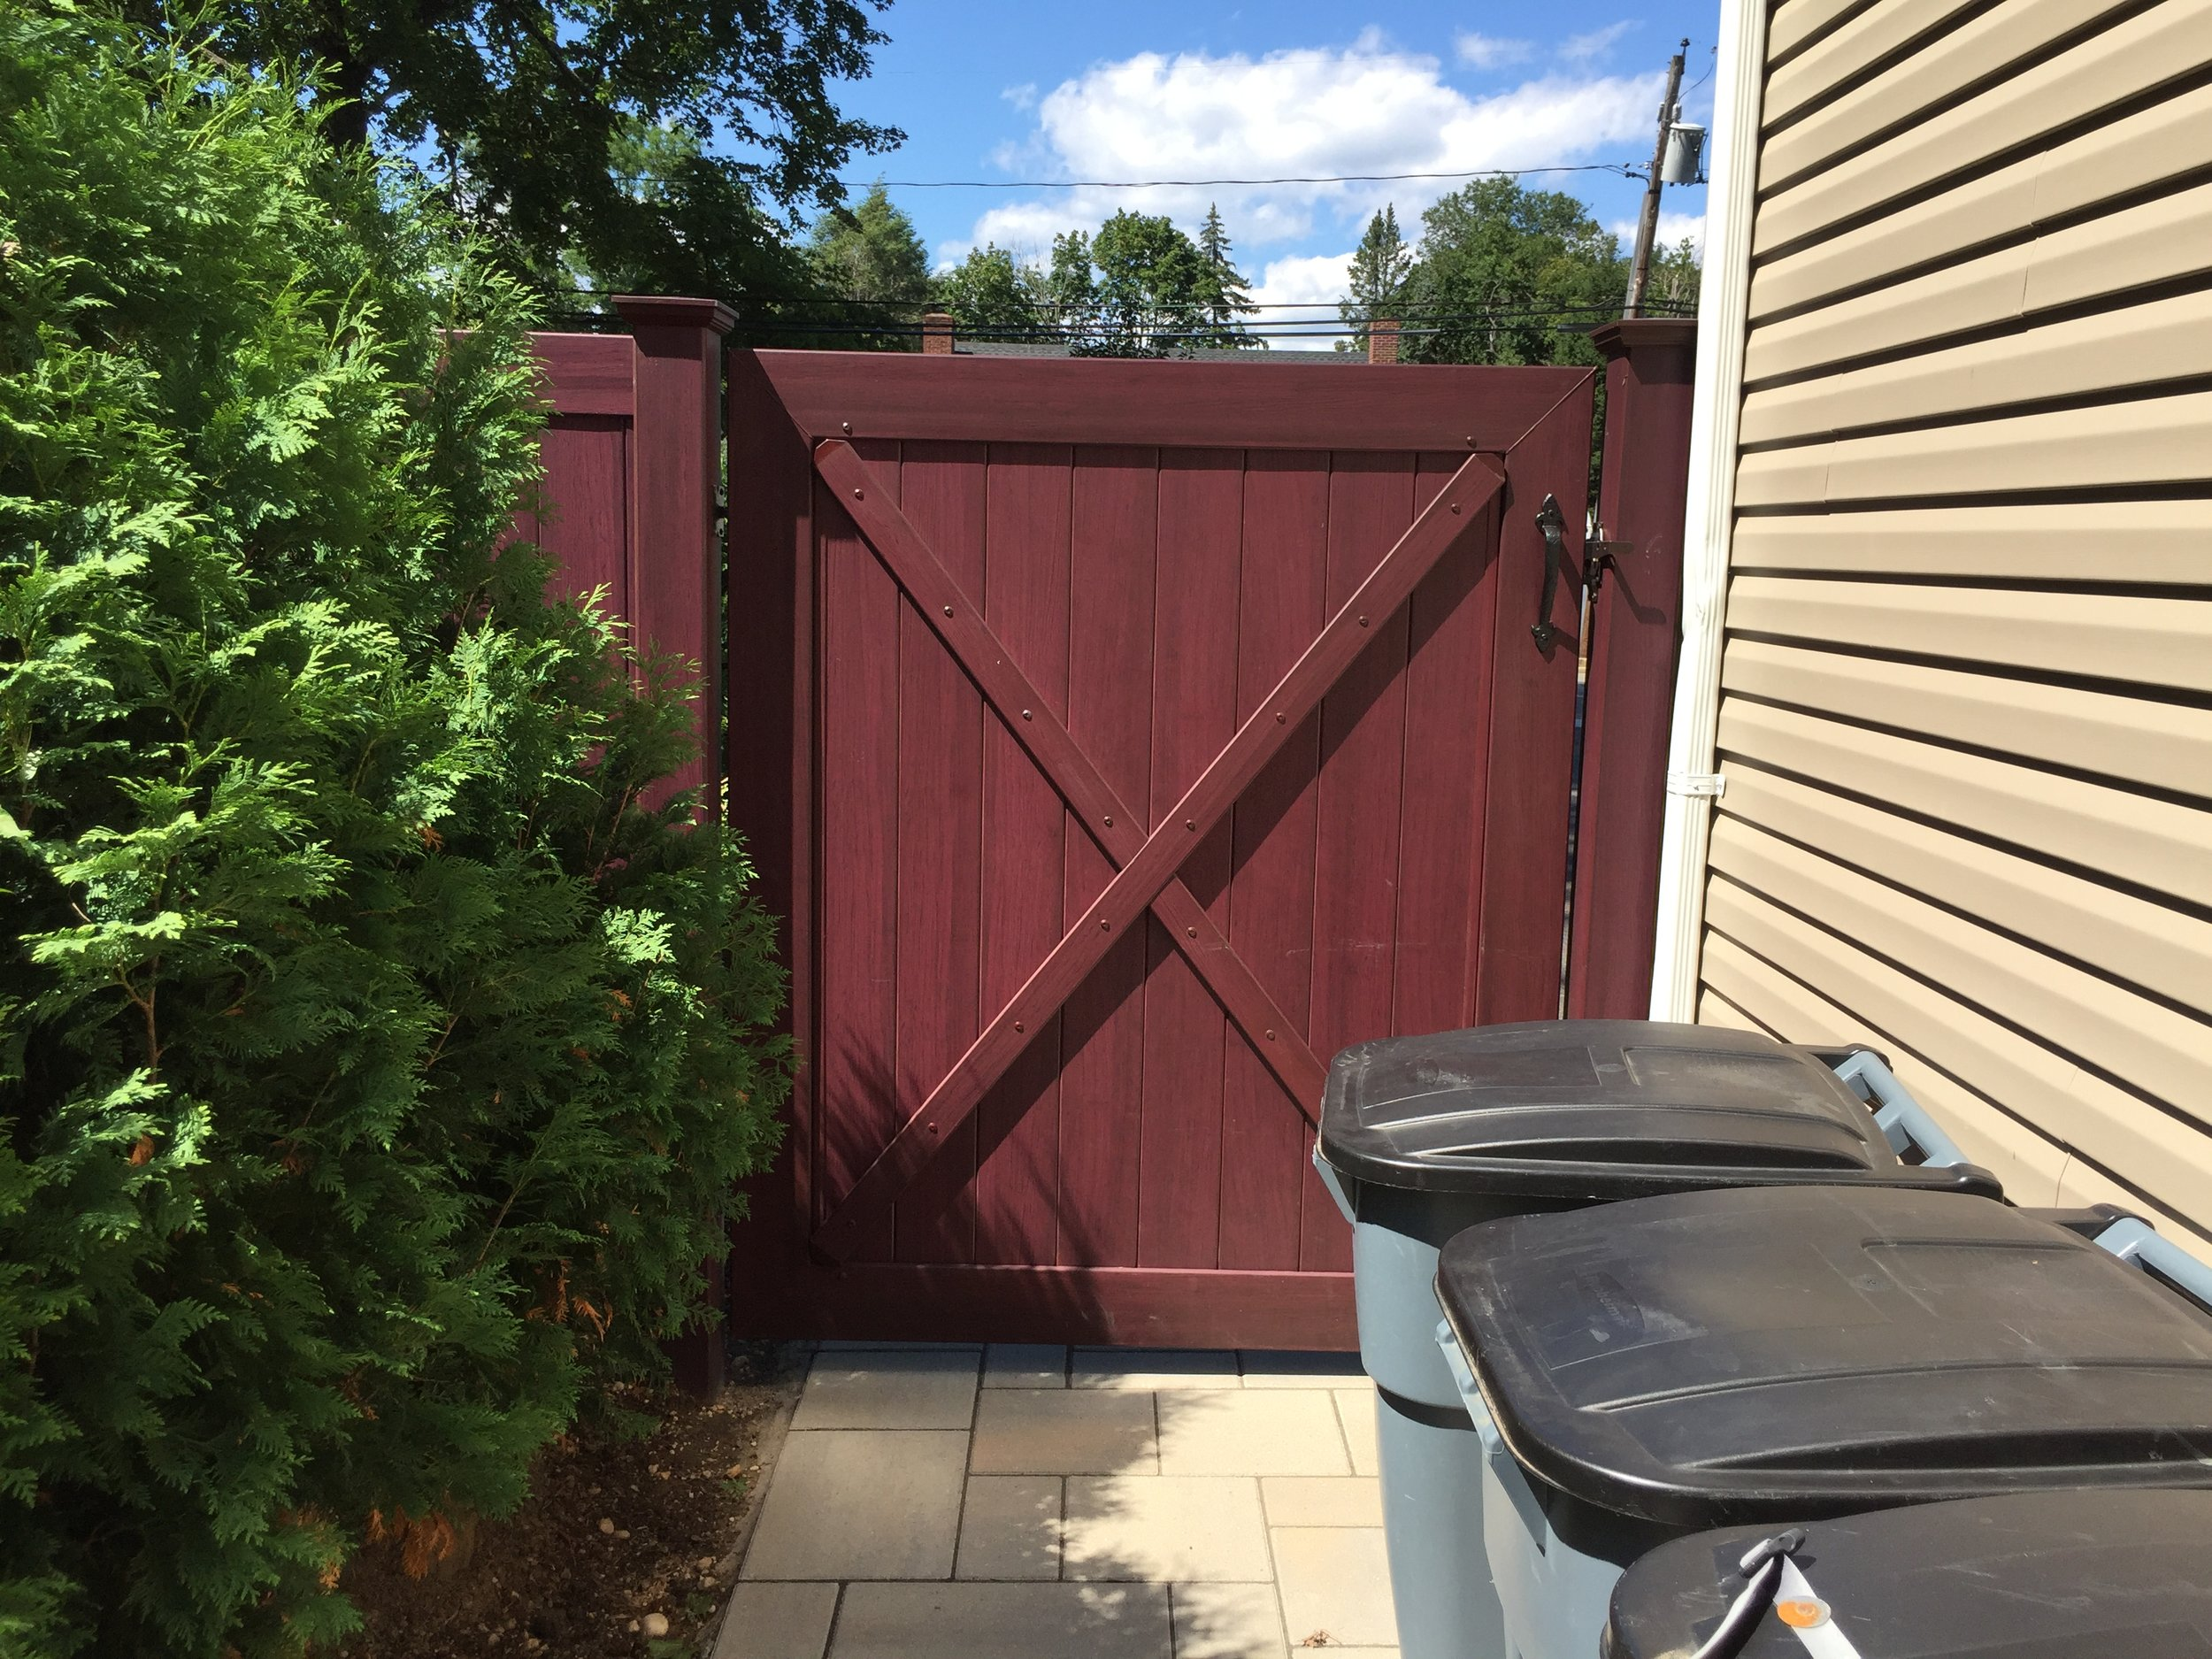 Experienced vinyl fence landscape design company in Long Island, NY